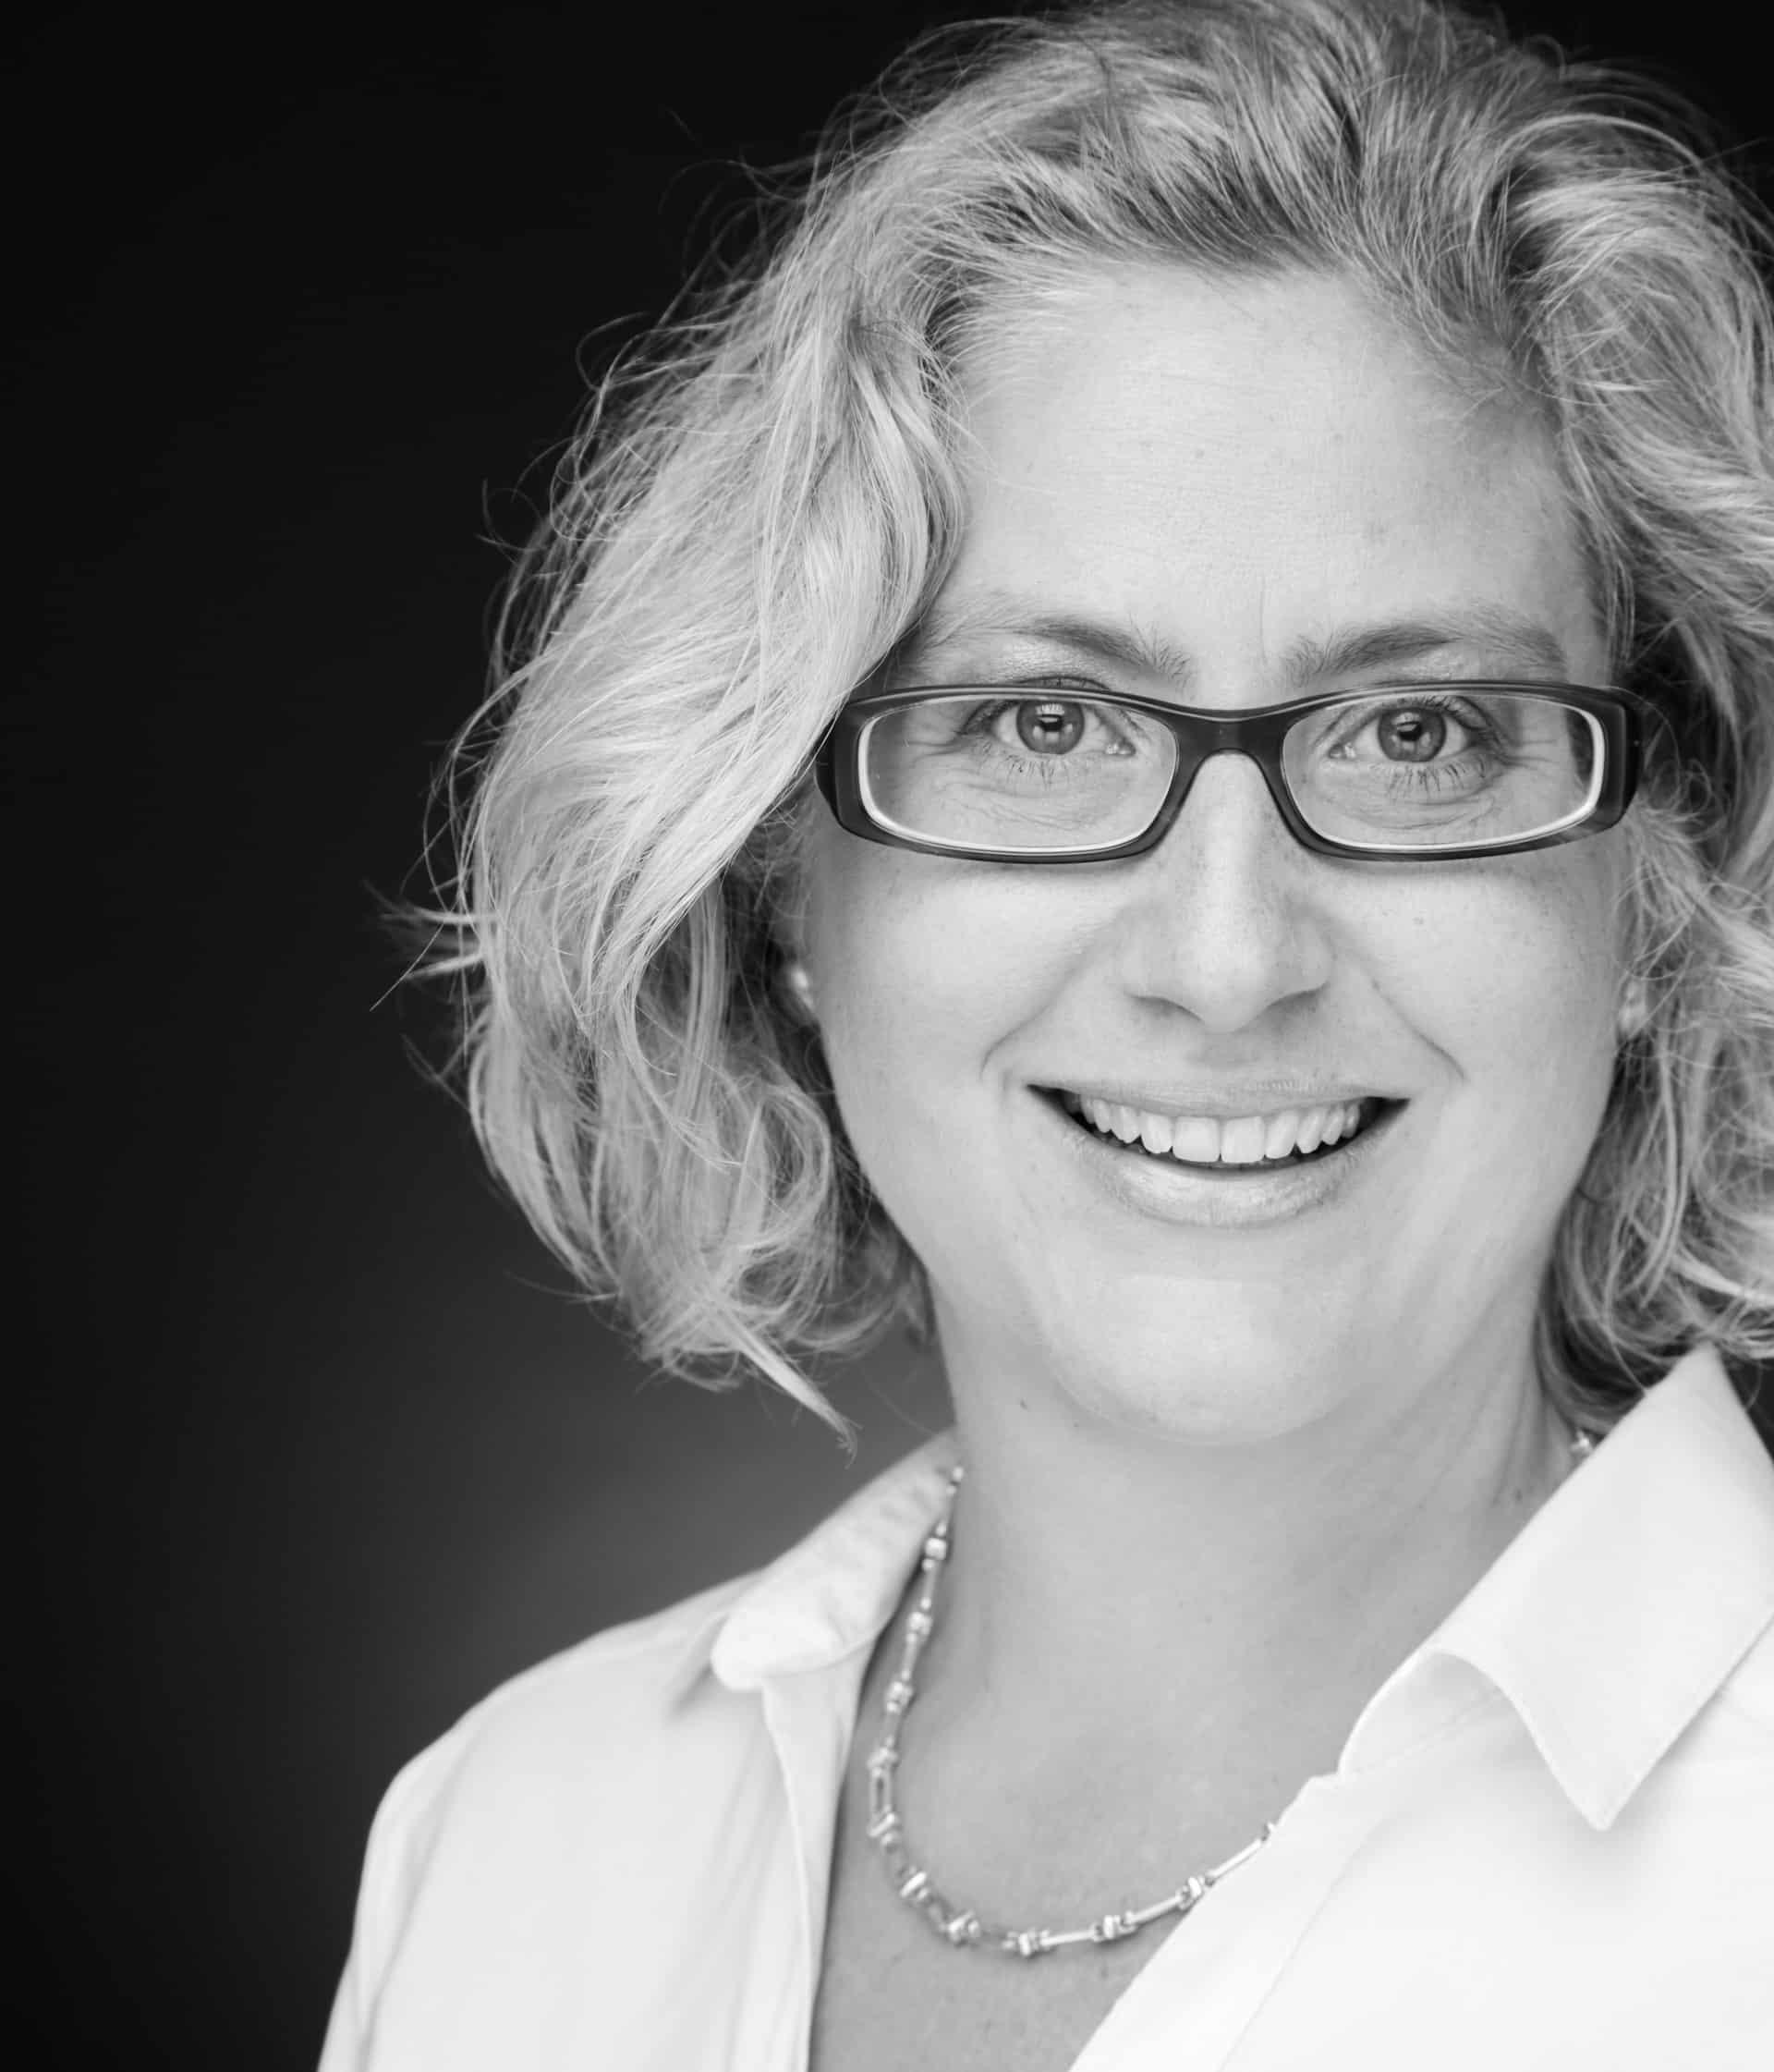 Dipl.-Psych. Kathrin Oßwald - Psychologische Psychotherapeutin in München- Lehel